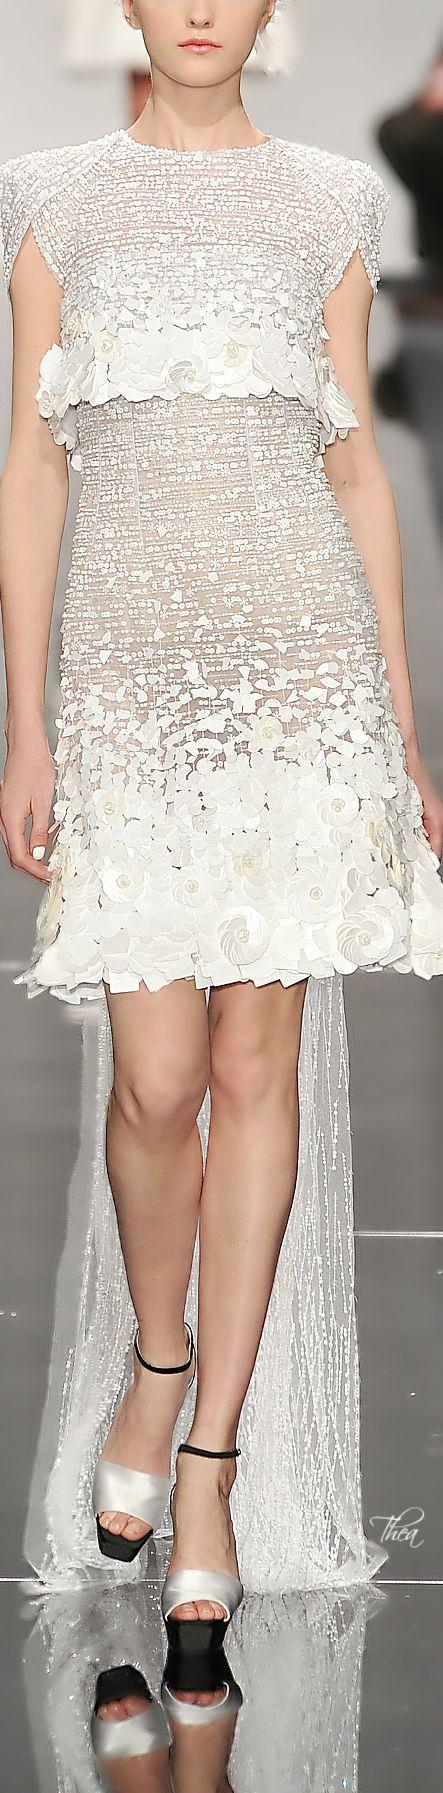 Chanel - a shimmering white delight!  jannastyleblog.com